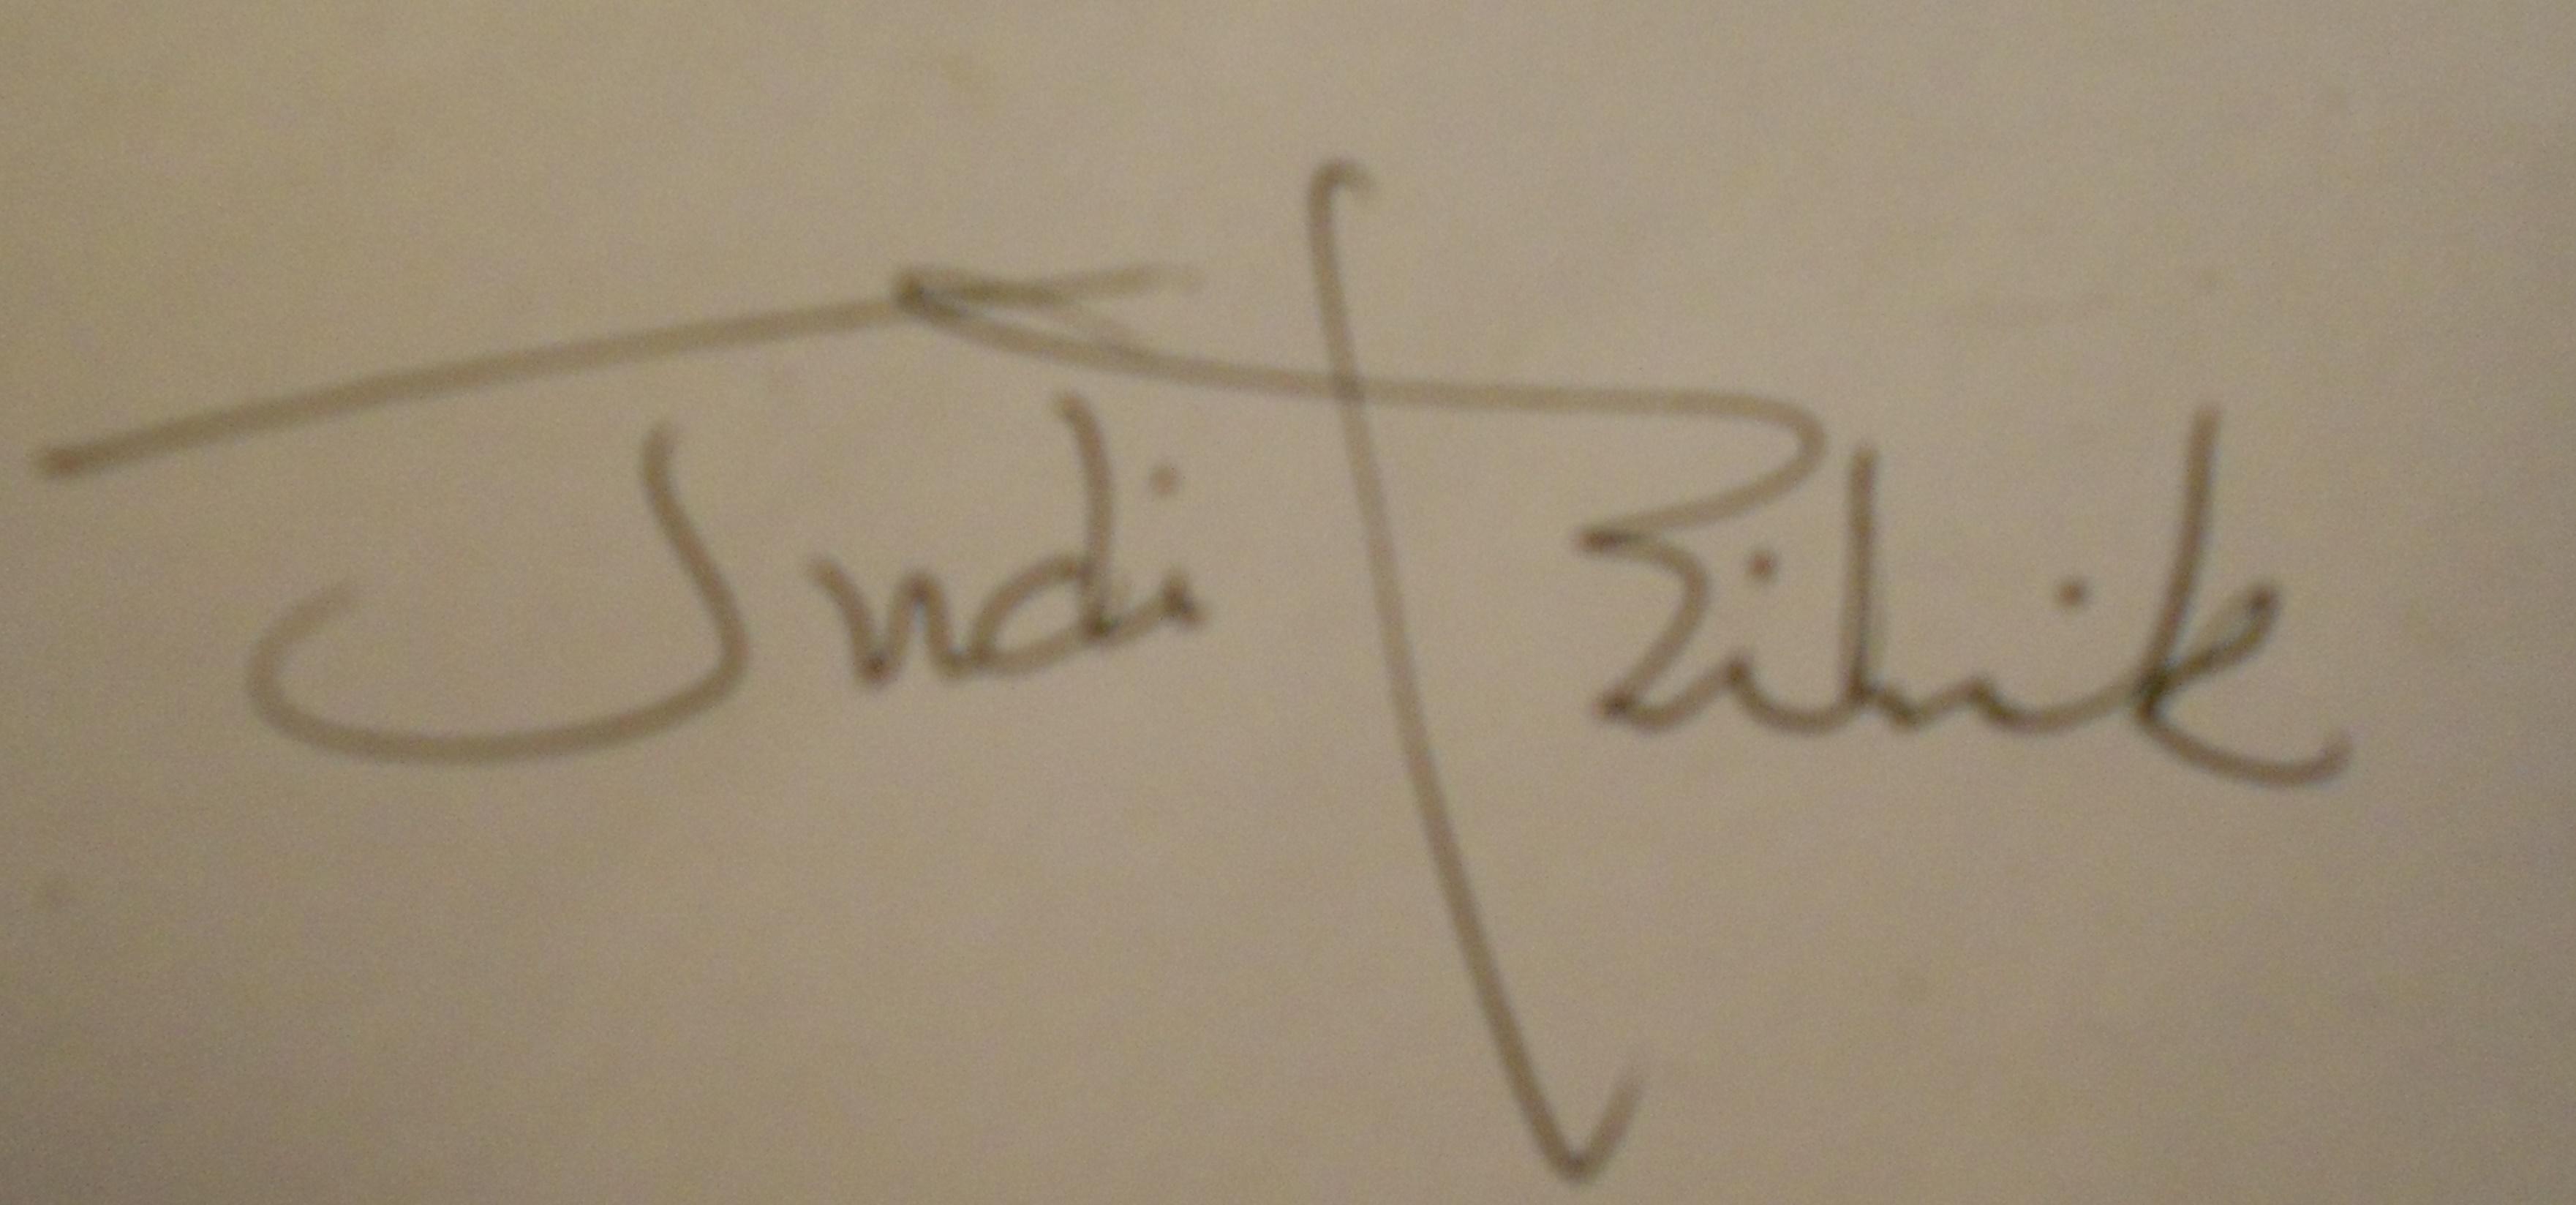 Judith bilick's Signature